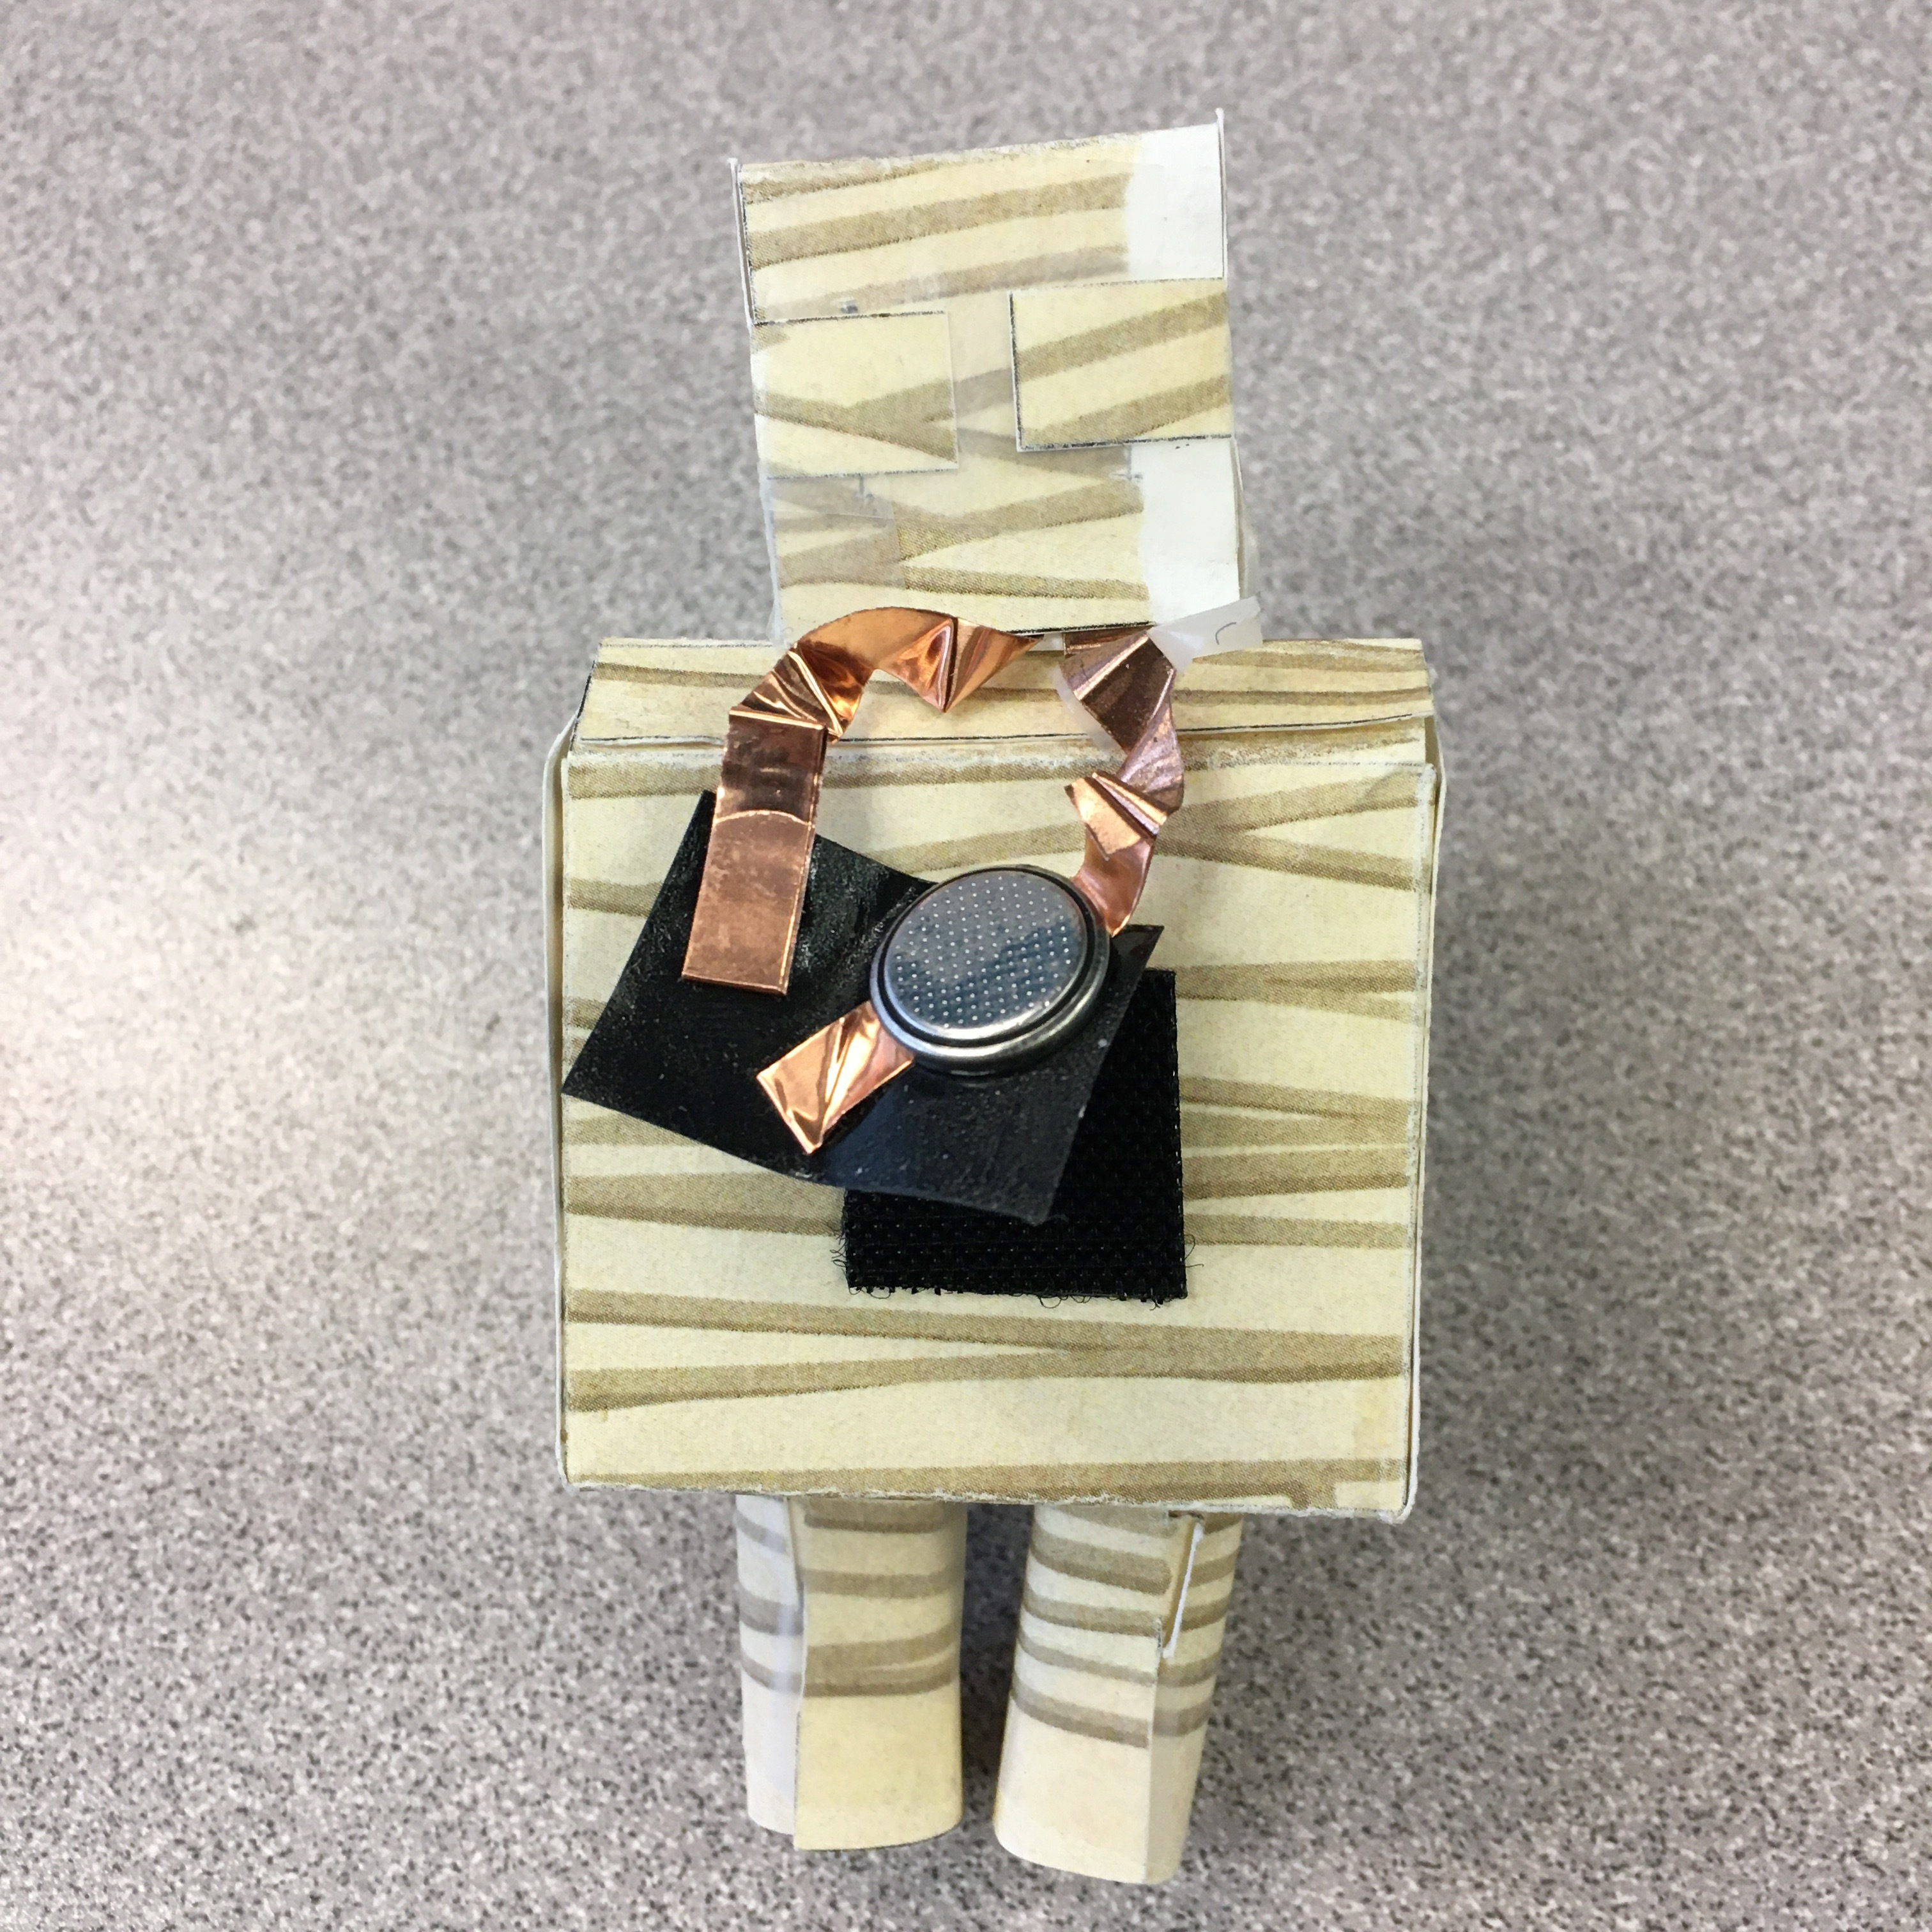 Https://www.instructables.com/id/Free-Halloween-Mummybot-Papercraft/